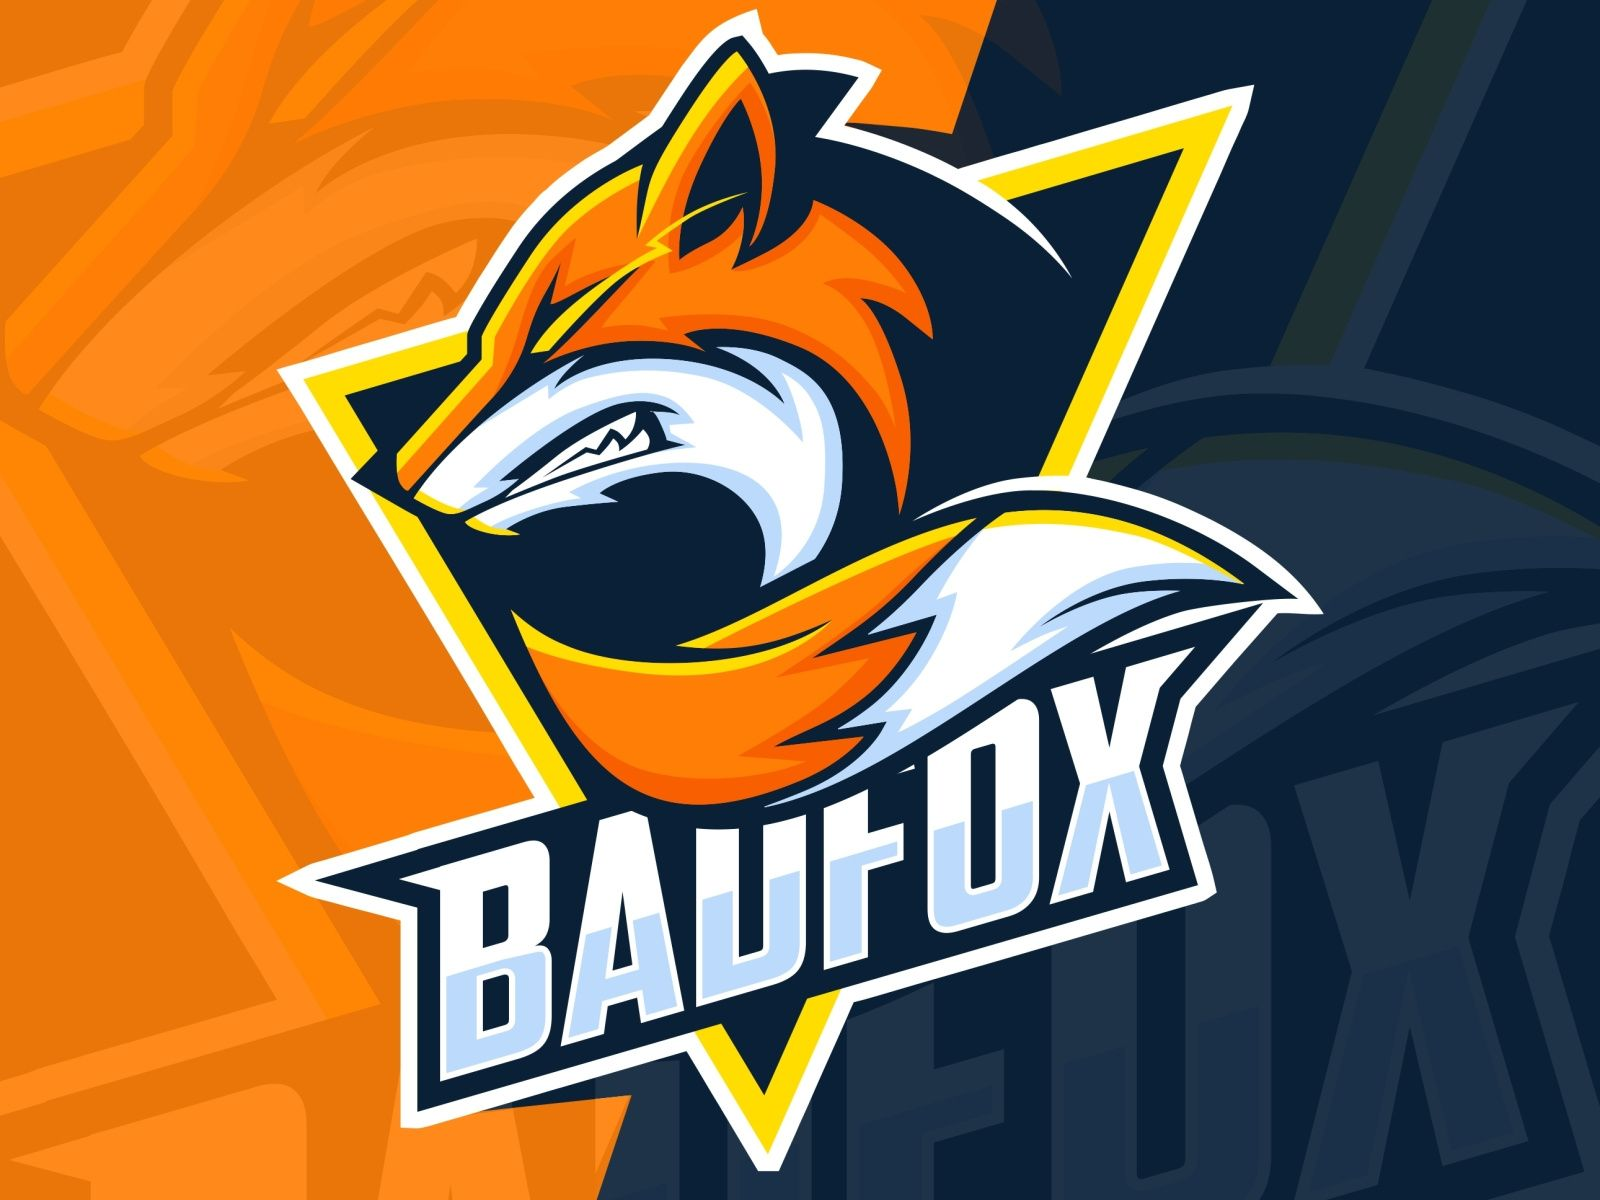 Pin on Fox mascot logo